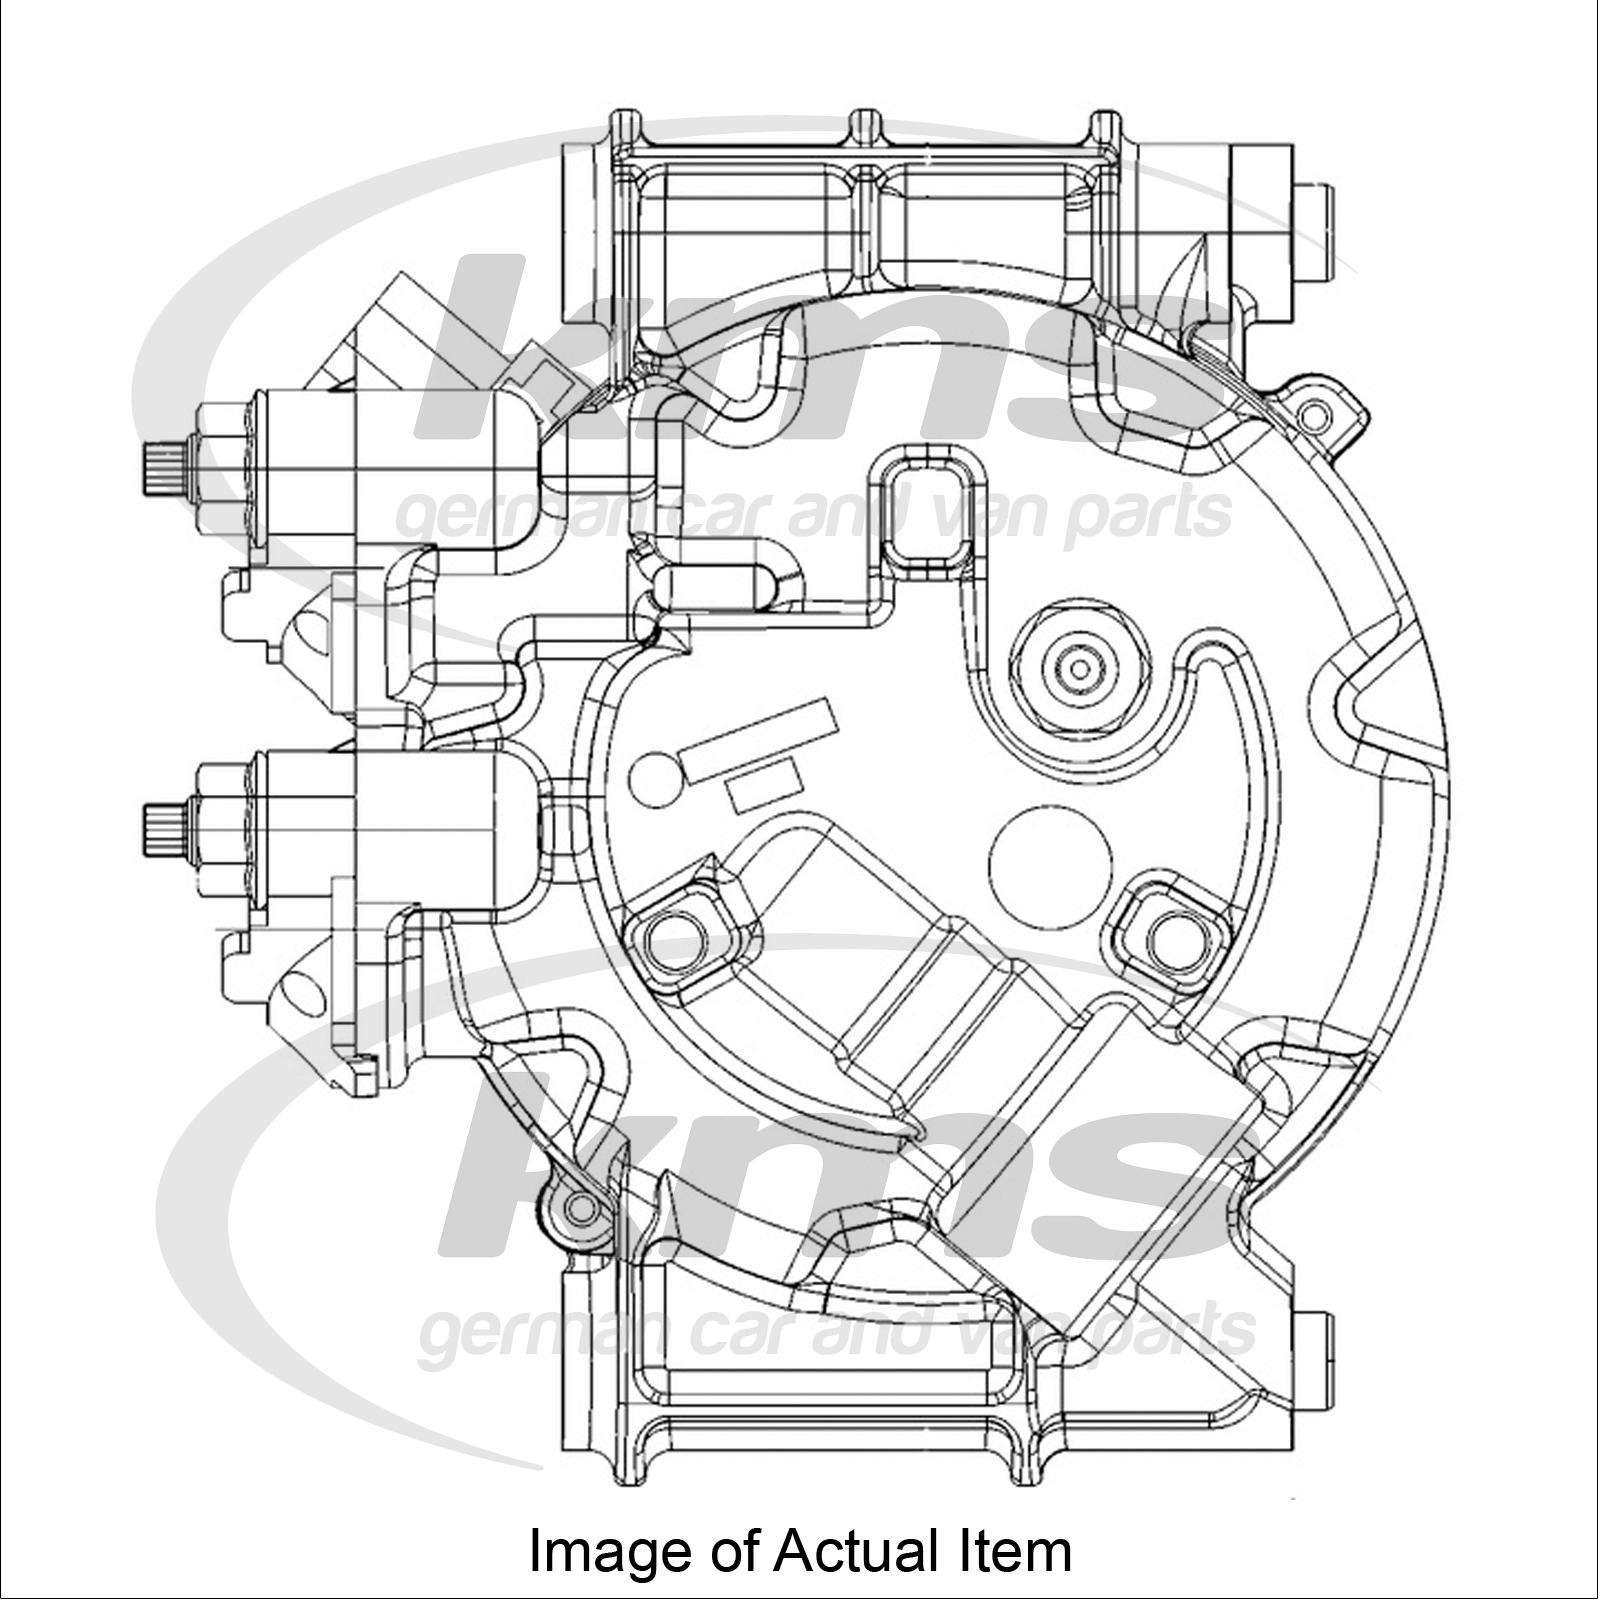 Sentinel new genuine hella air conditioning pressor 8fk 351 334 441 top german quality